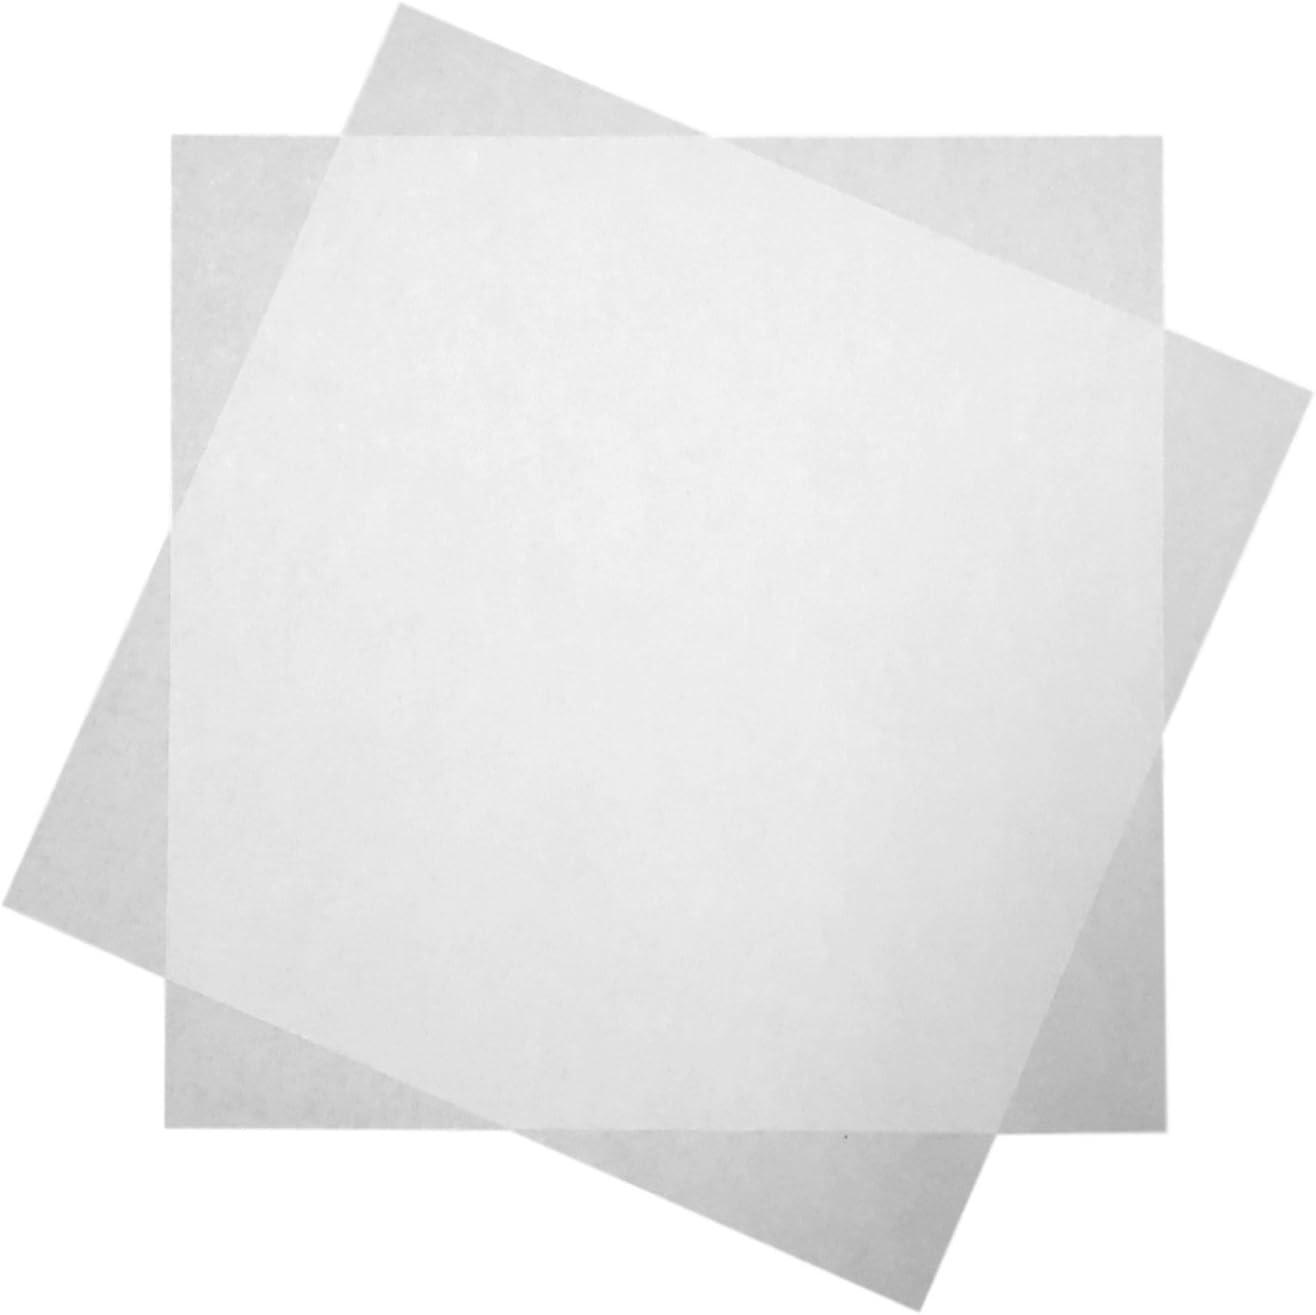 Deli Squares - Wax Paper Sheets (12 x 12) (Pack of 100) (Plain)